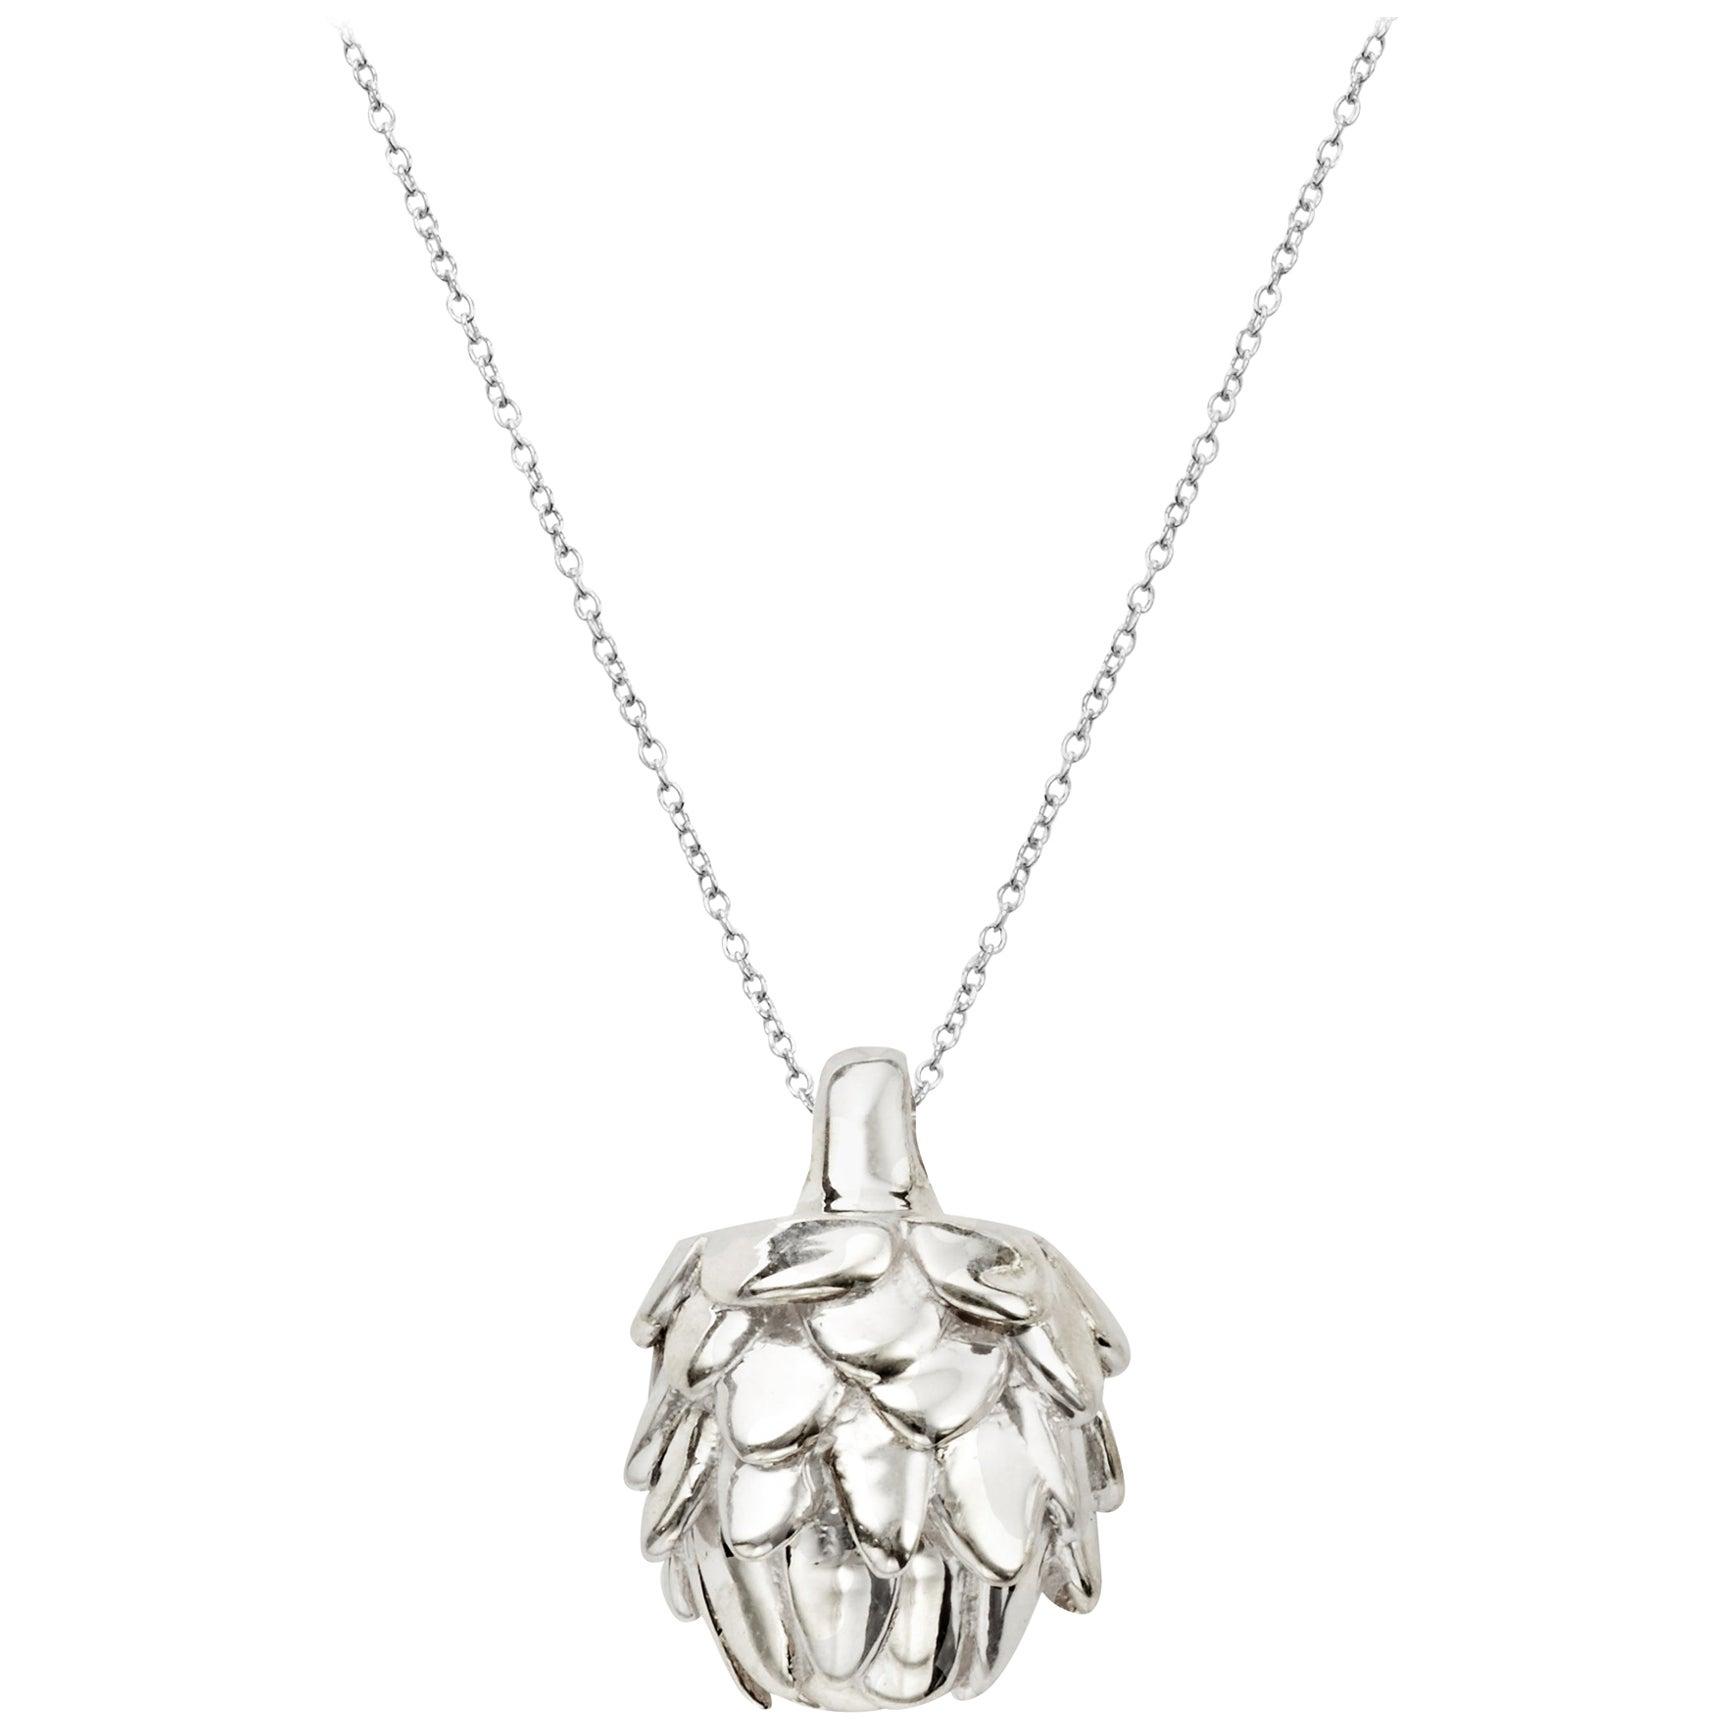 AGMES Sterling Silver Mini Artichoke Pendant Necklace on Chain